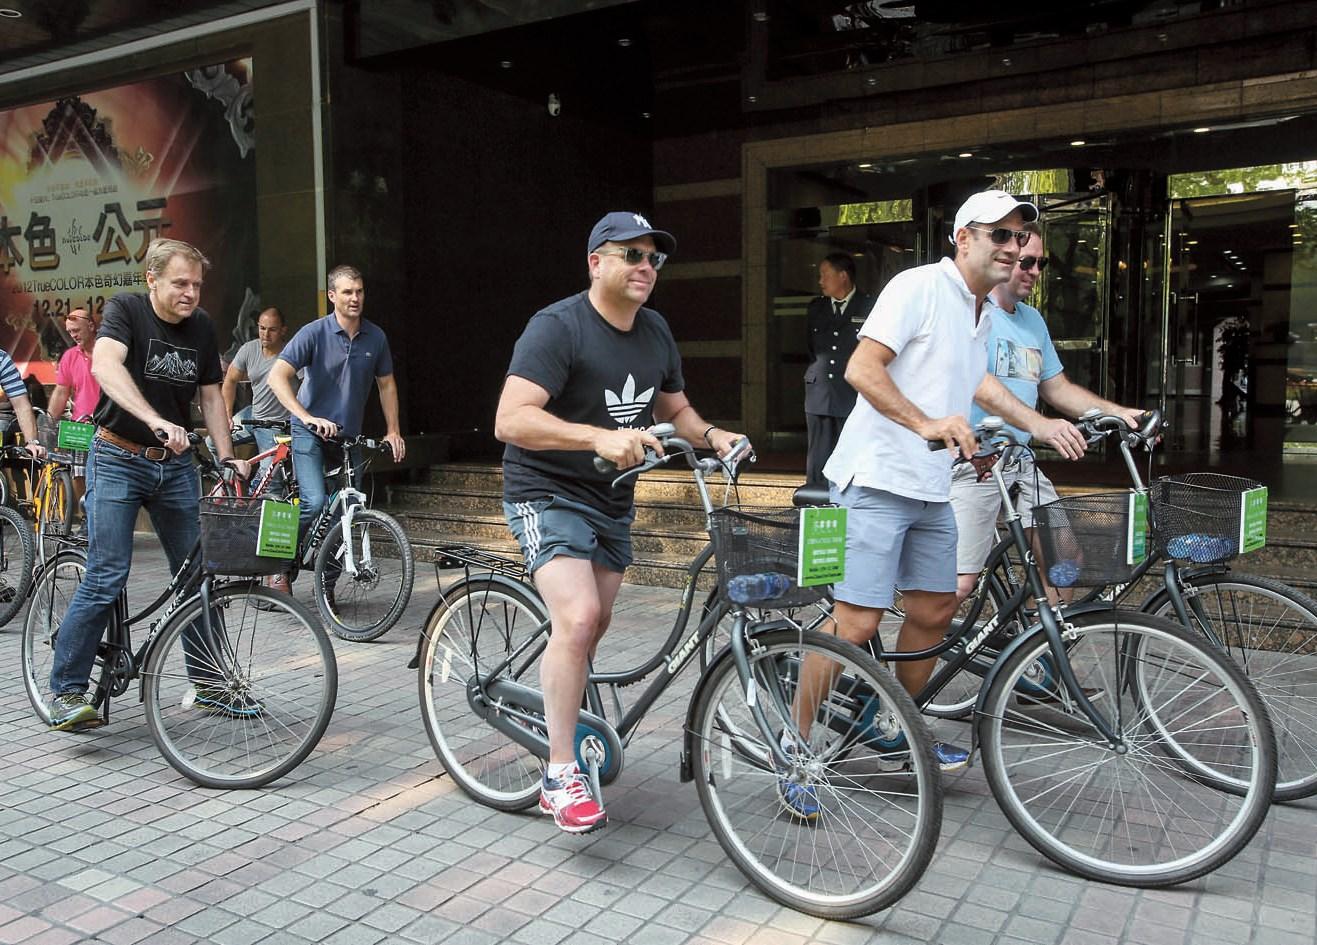 A group of expats ride bikes in downtown Shanghai. — Wang Rongjiang